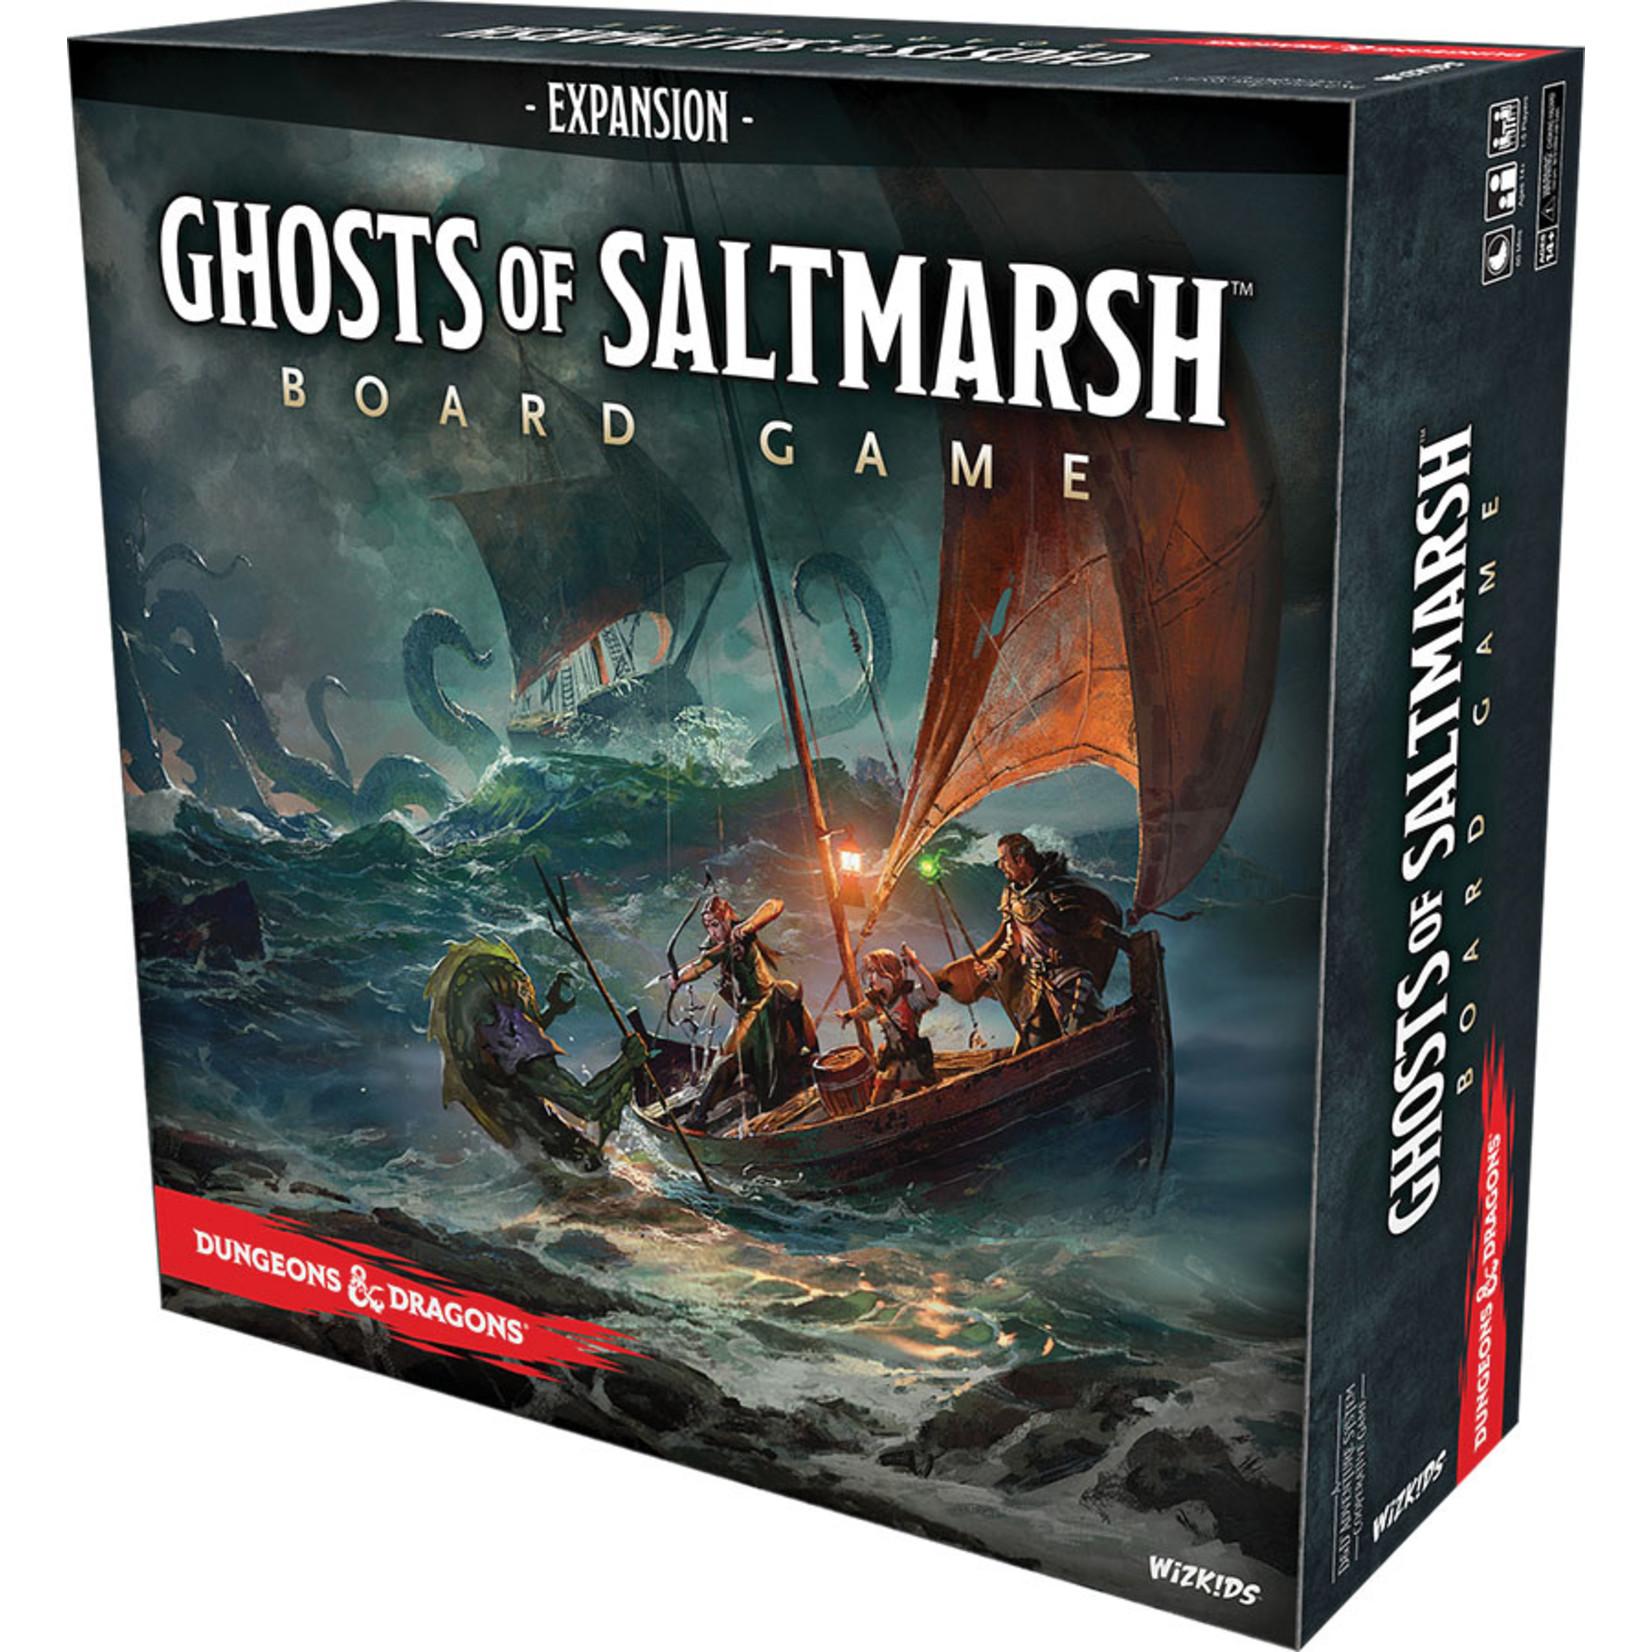 PRE-ORDER Dungeons & Dragons: Ghosts of Saltmarsh Adventure System Board Game